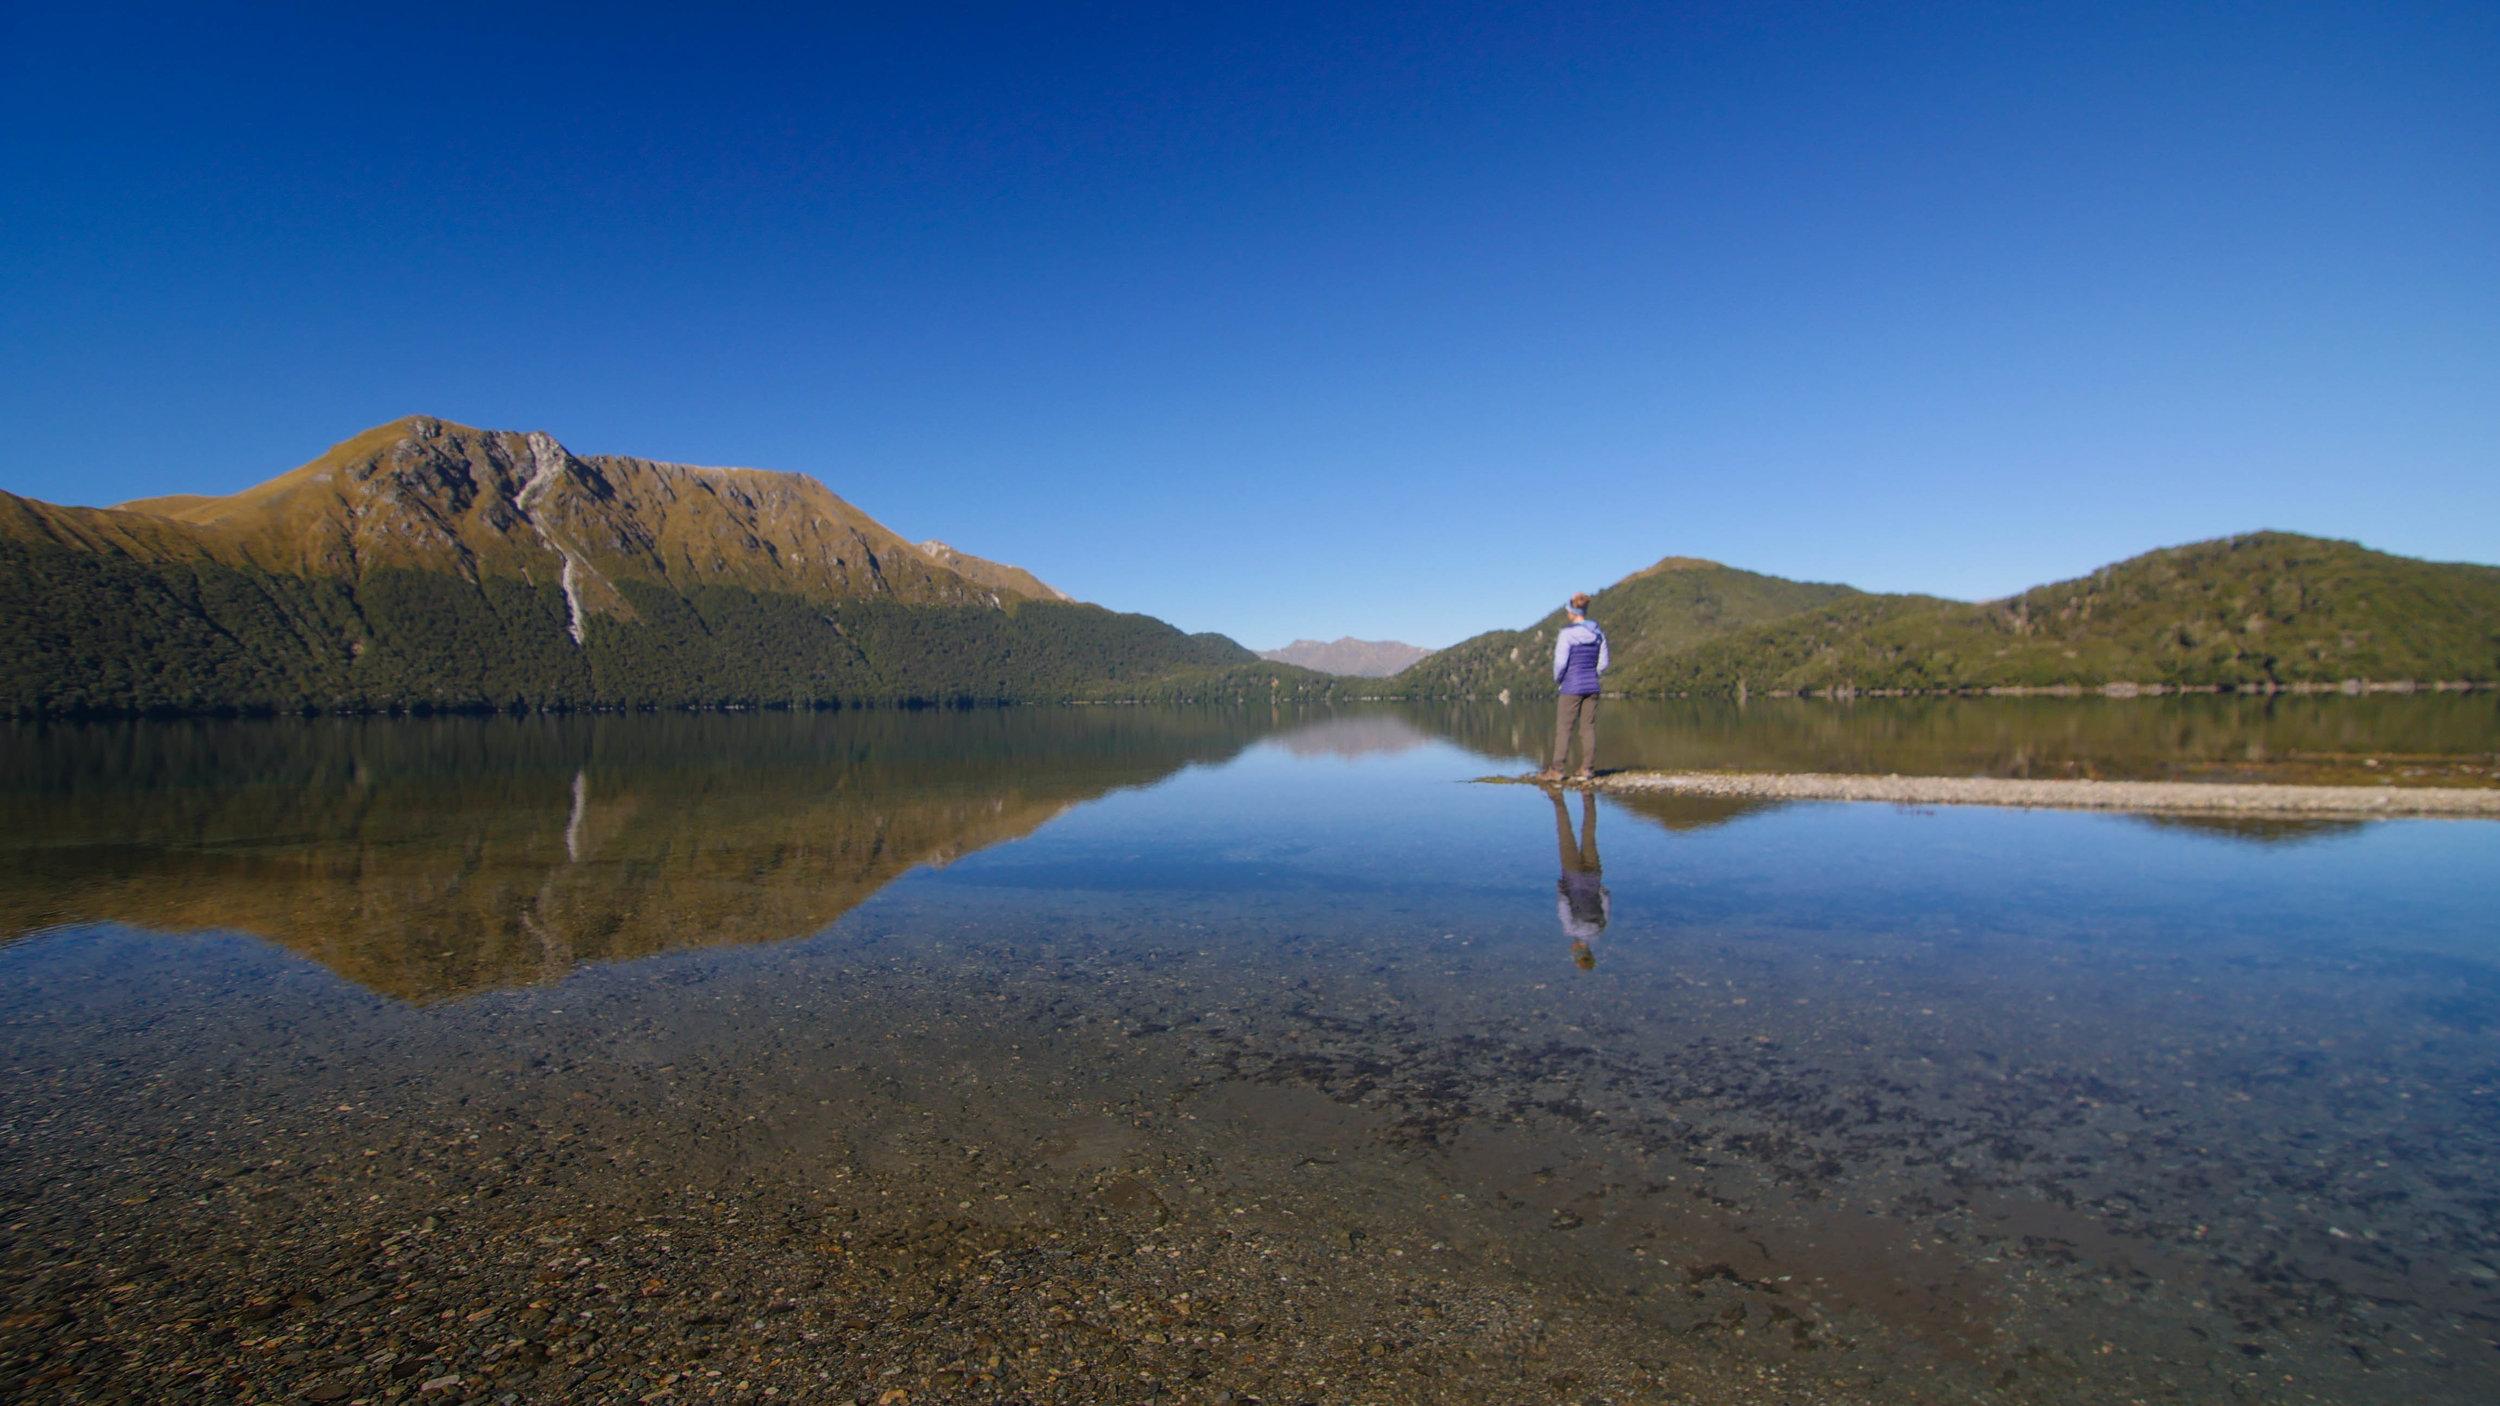 Green Lake Hut Lake Monowai Fiordland NAtional Park New Zealand (9 of 9).jpg